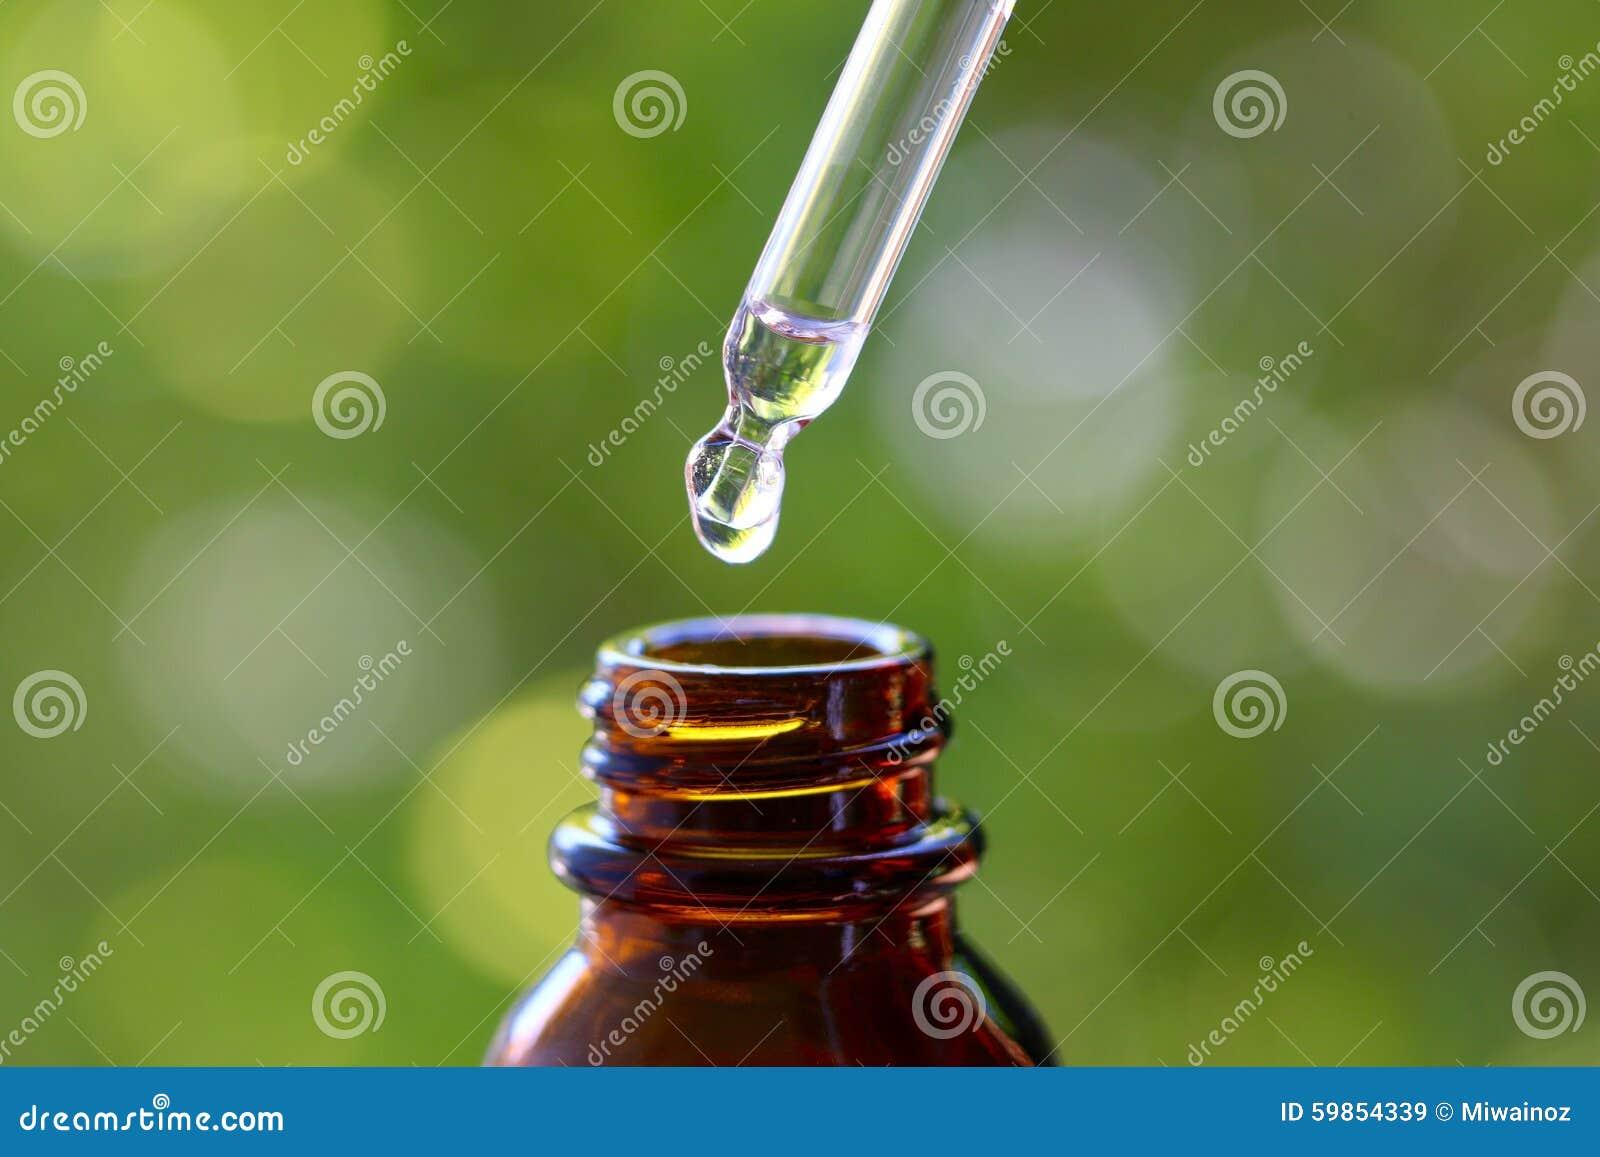 Dropper και γυαλιού μπουκάλι